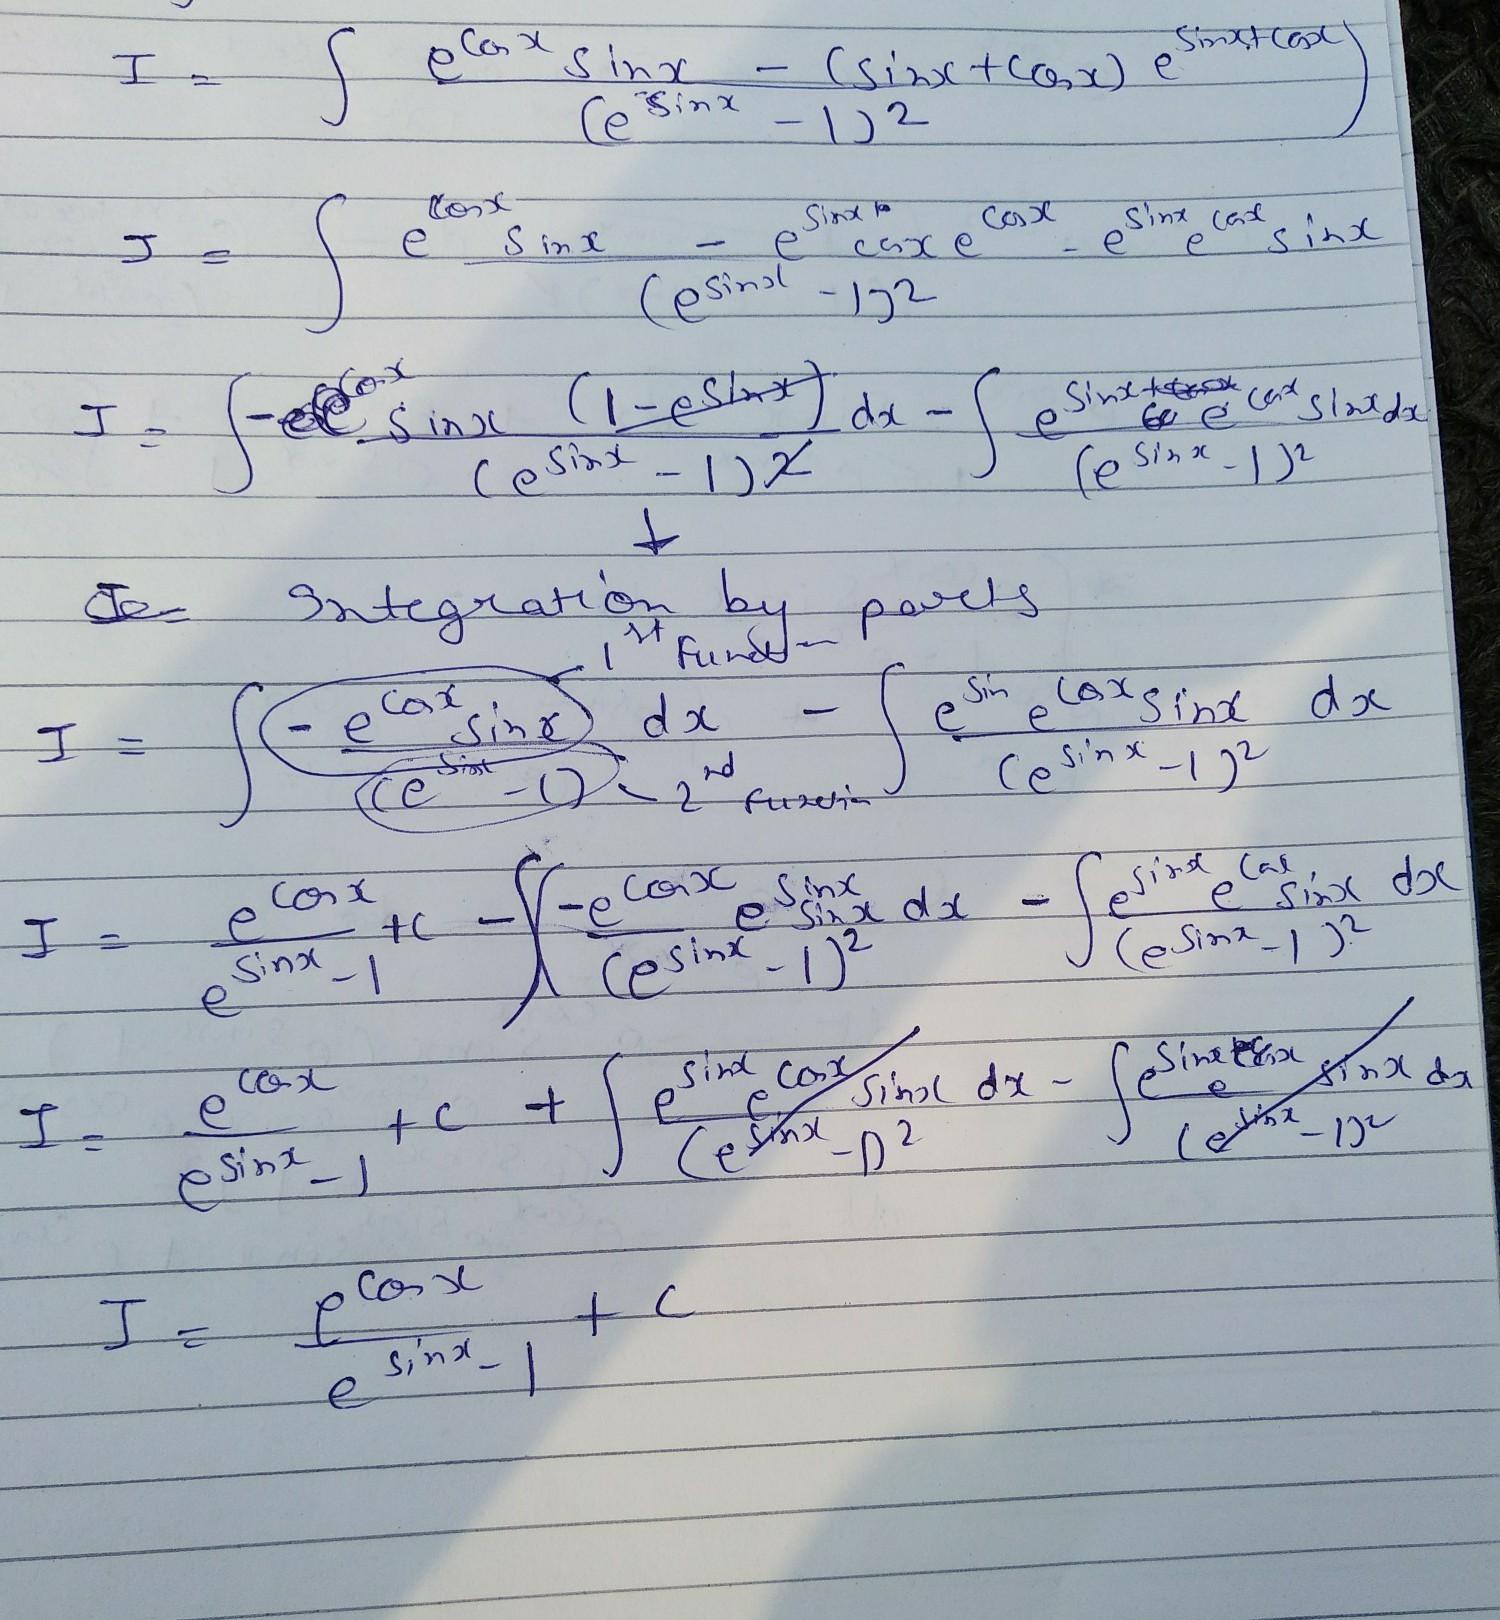 tex] I =[ \\int\\frac{ sinxe^{cosx} -(sinx + cosx) e^{sinx + cosx}}{e ...